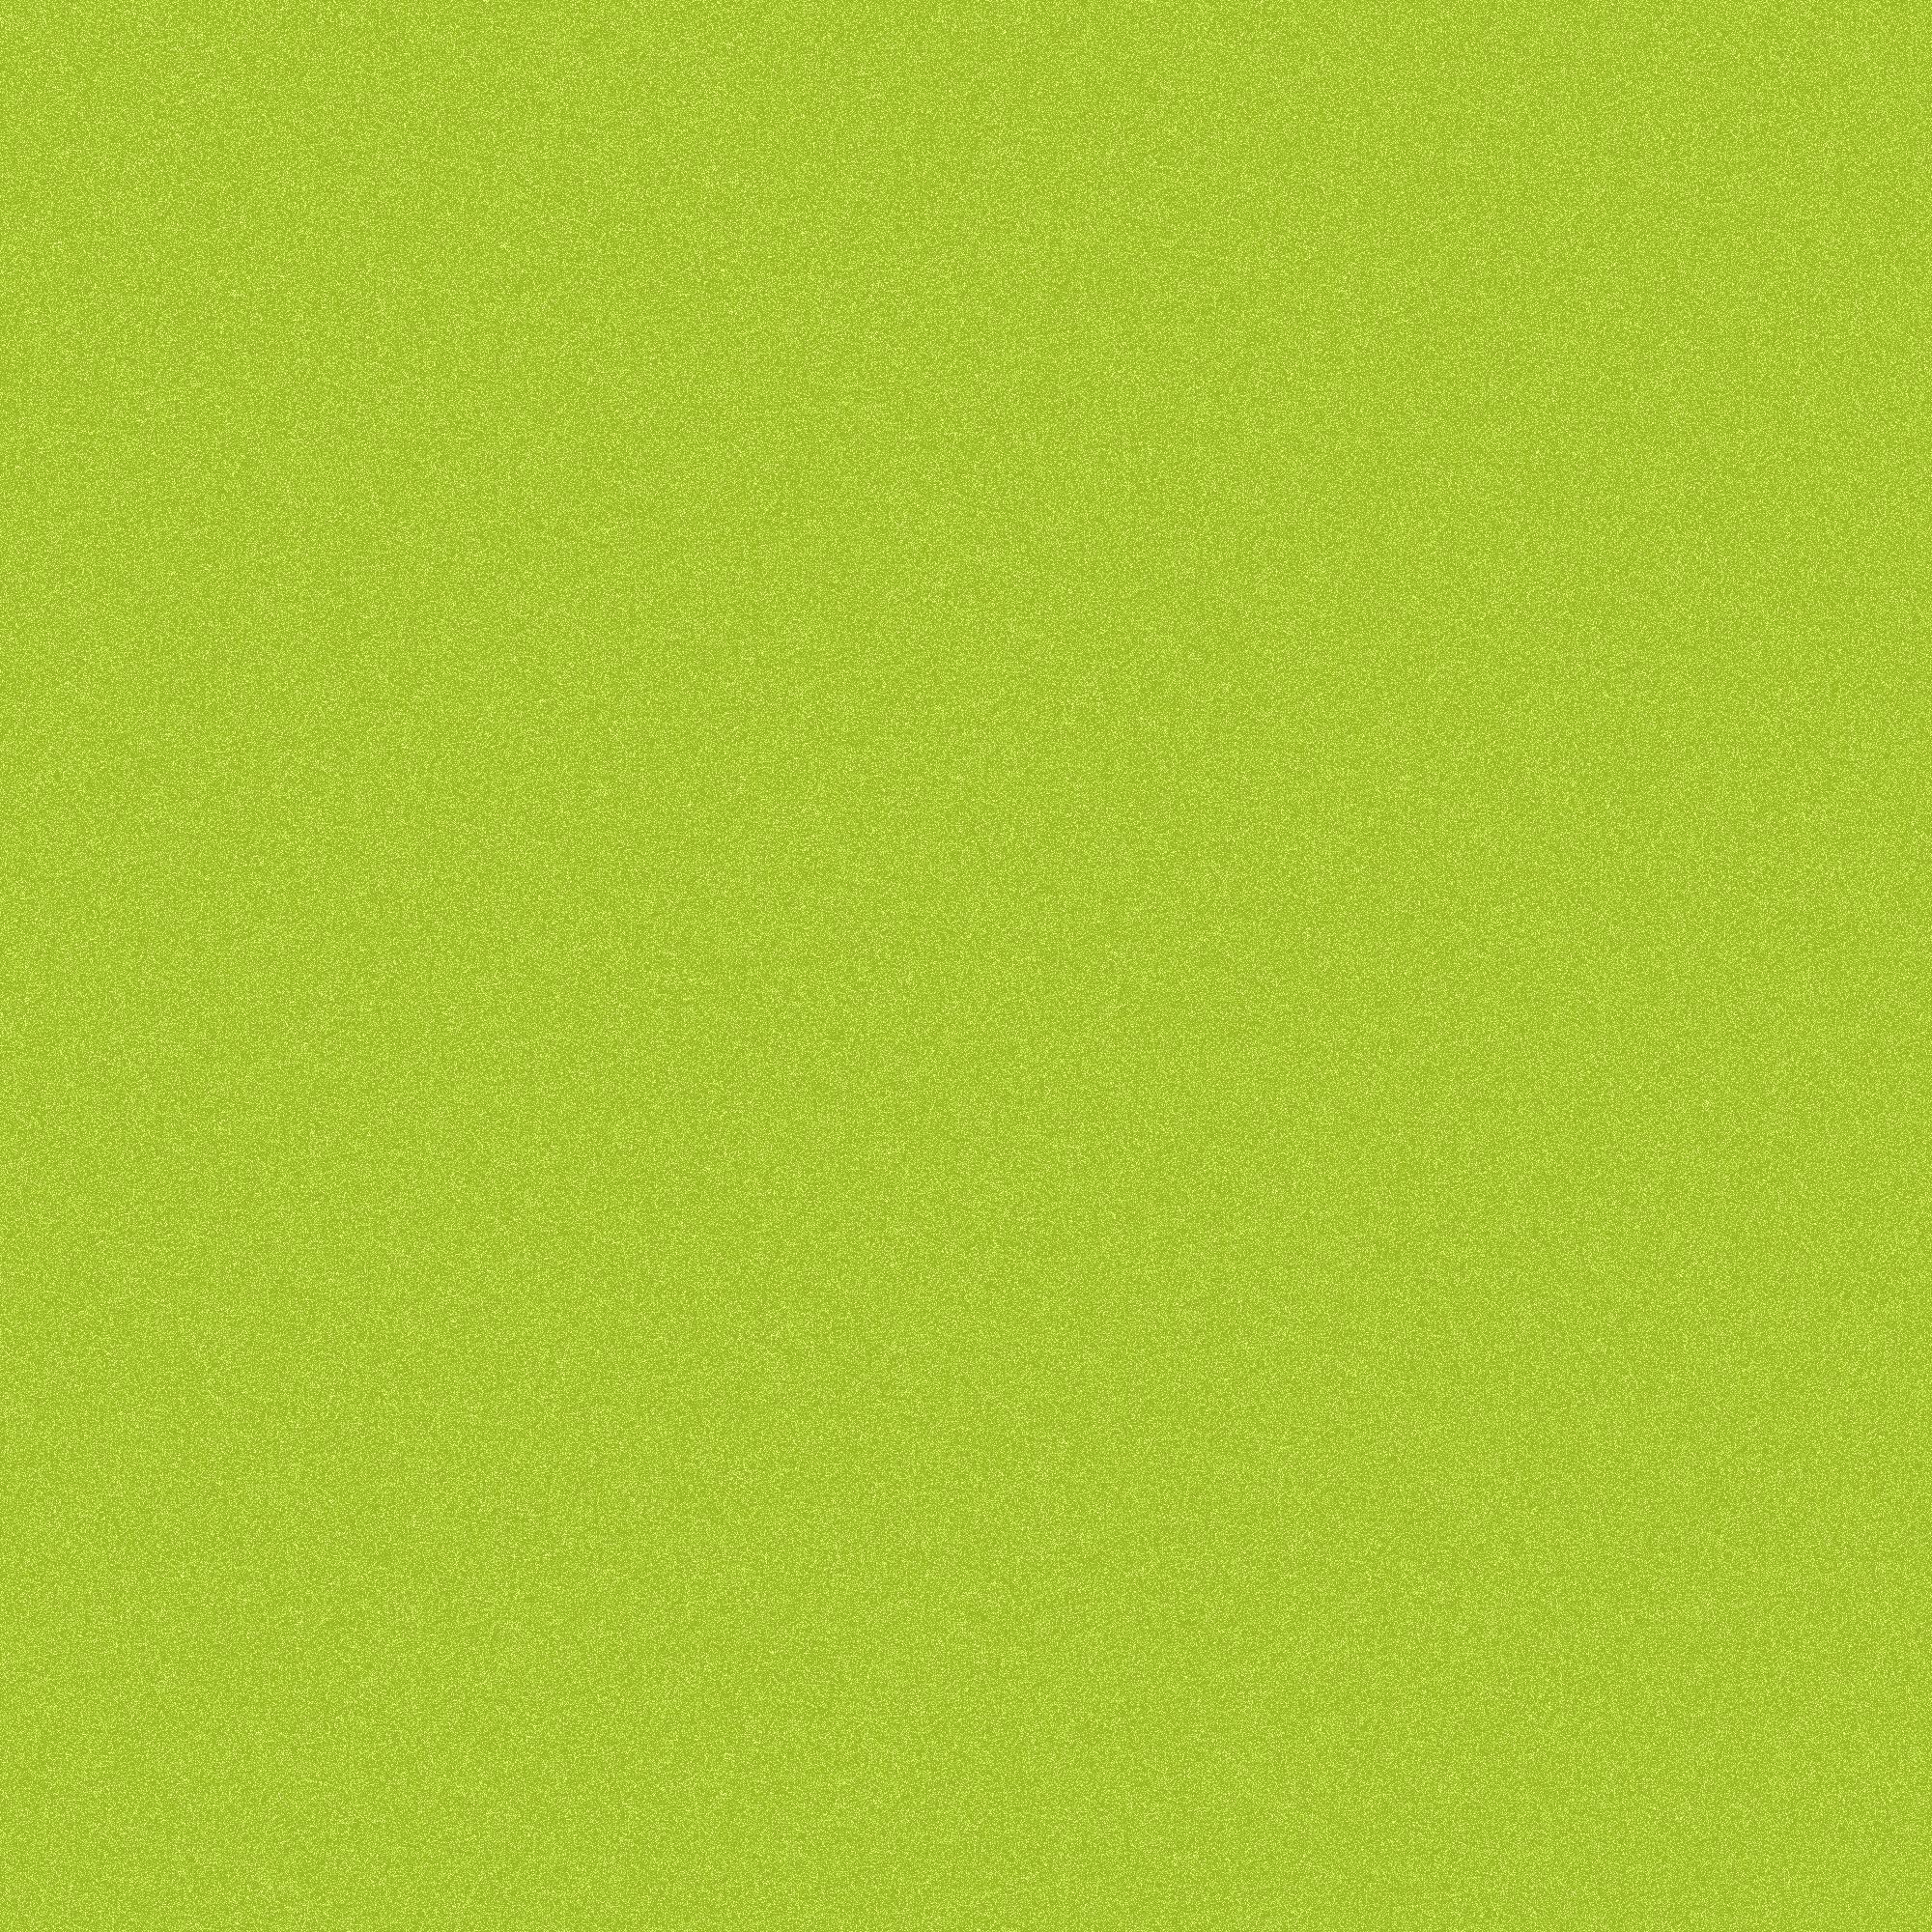 Light Green Noise background texture PNGPublic Domain ICON PARK 2000x2000